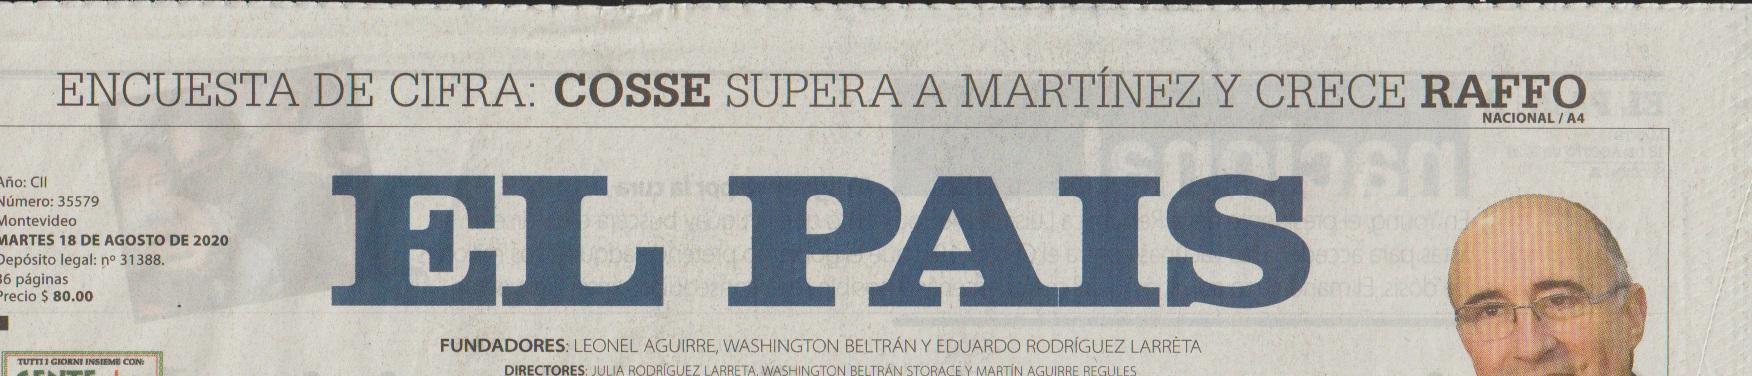 DIARIO EL PAIS 18-8 (PORTADA)